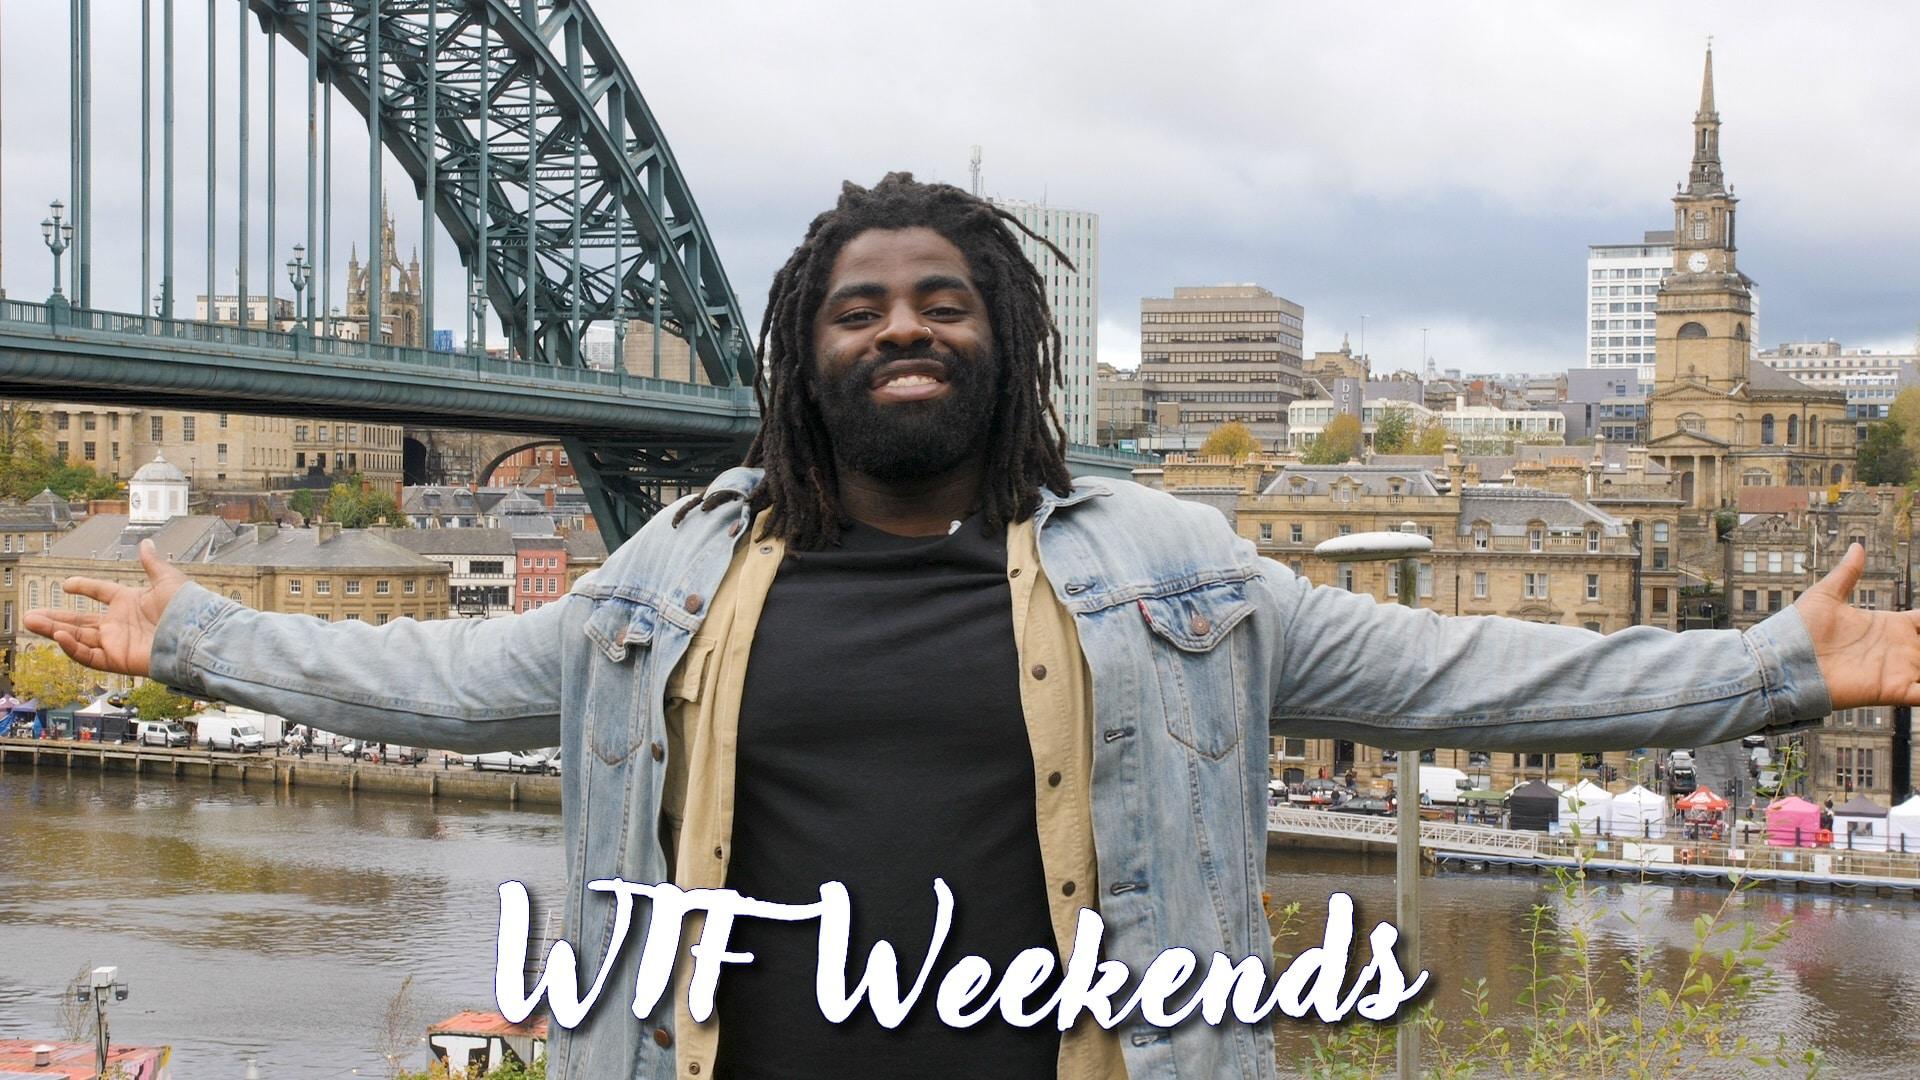 WTF Weekends News Image